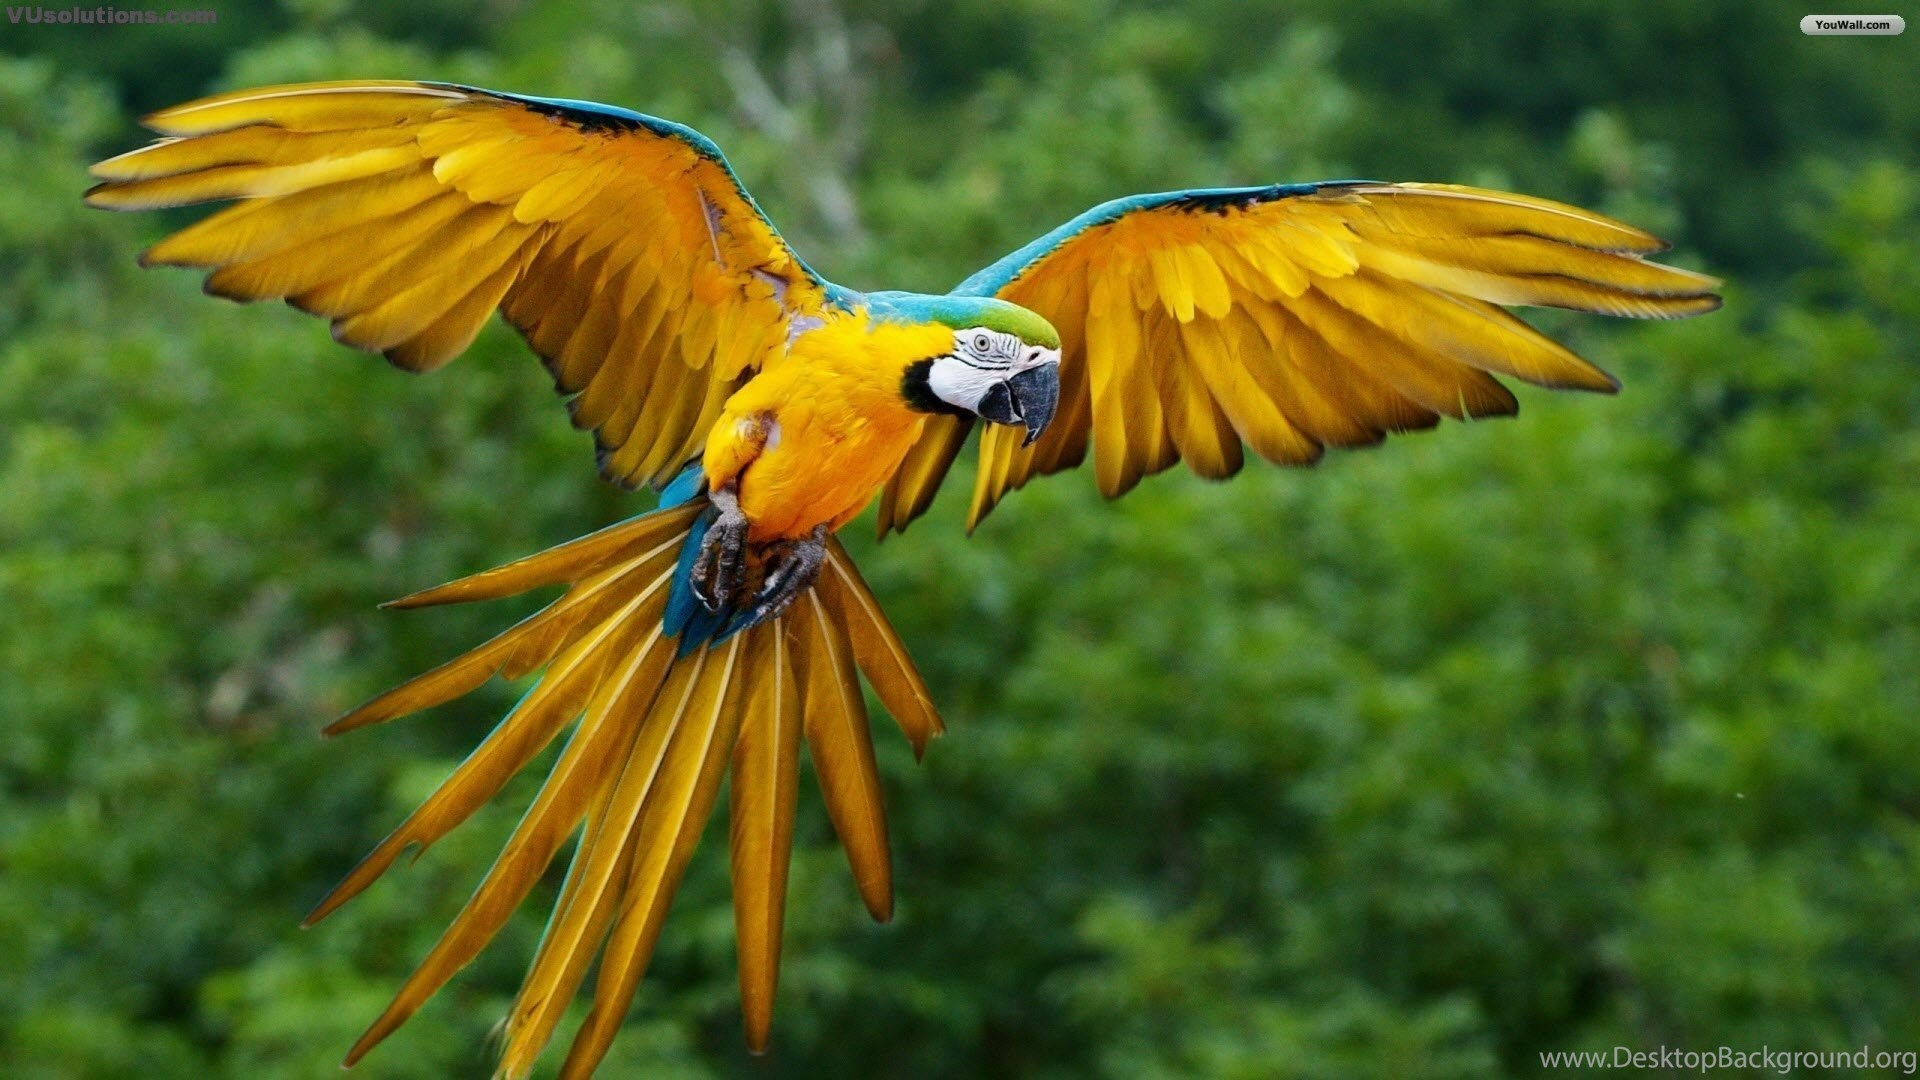 Flying Birds Hd Free For Iphone Pc Desktop Hd Wallpapers Desktop Background